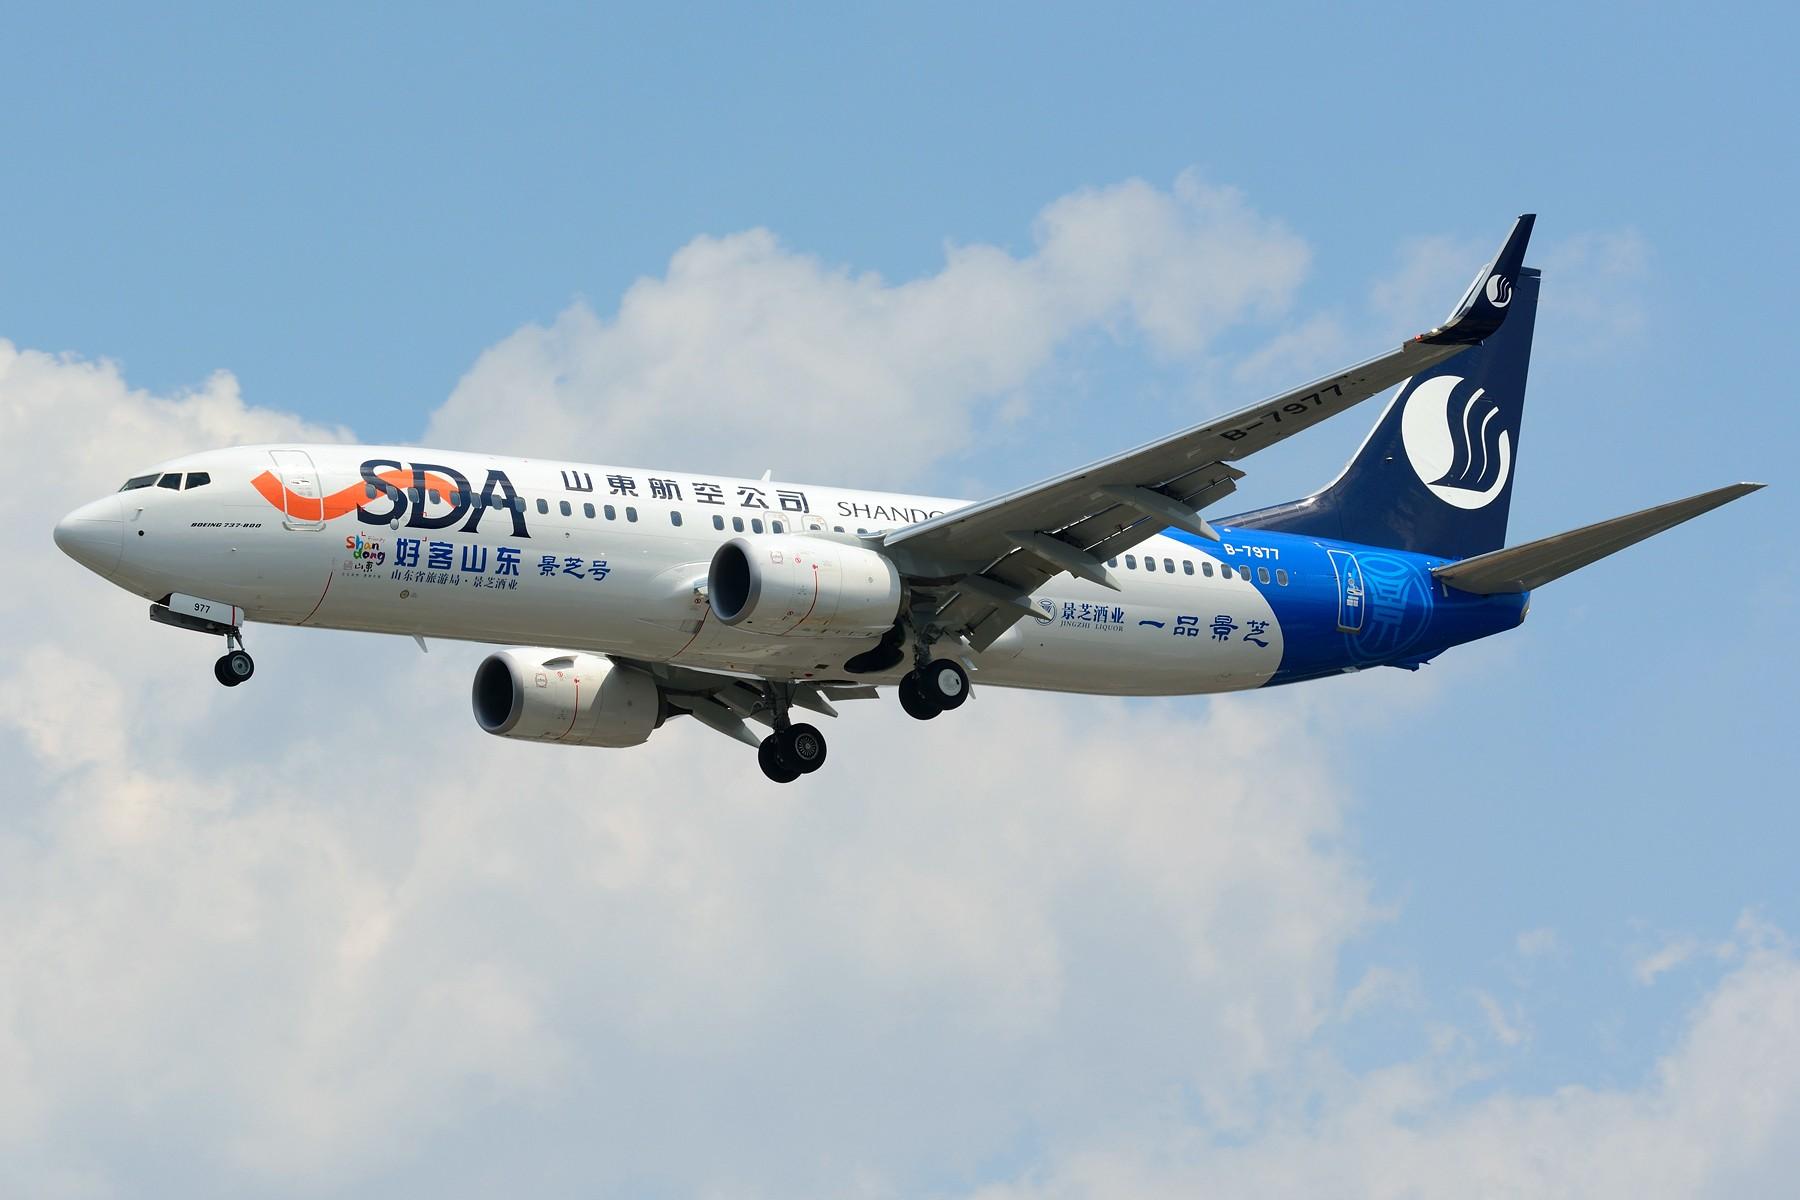 Re:[原创]【SHA】山东航空第一架景芝号彩绘 B-7977 BOEING 737-800 B-7977 中国上海虹桥国际机场